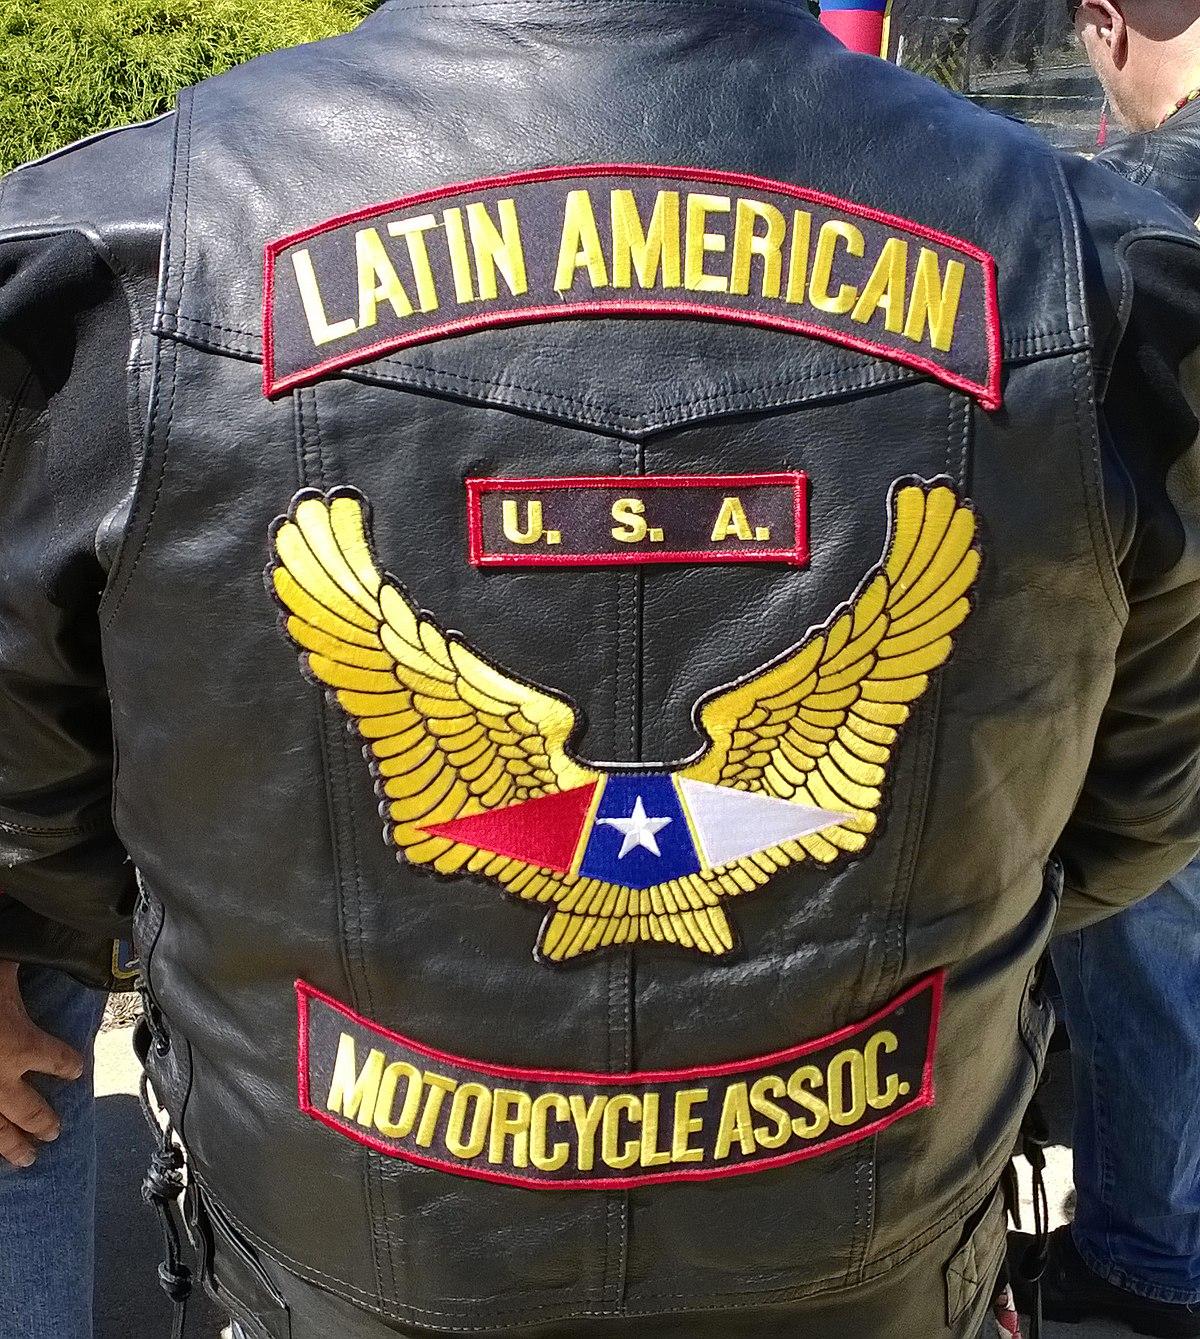 Latin American Motorcycle Association Wikipedia